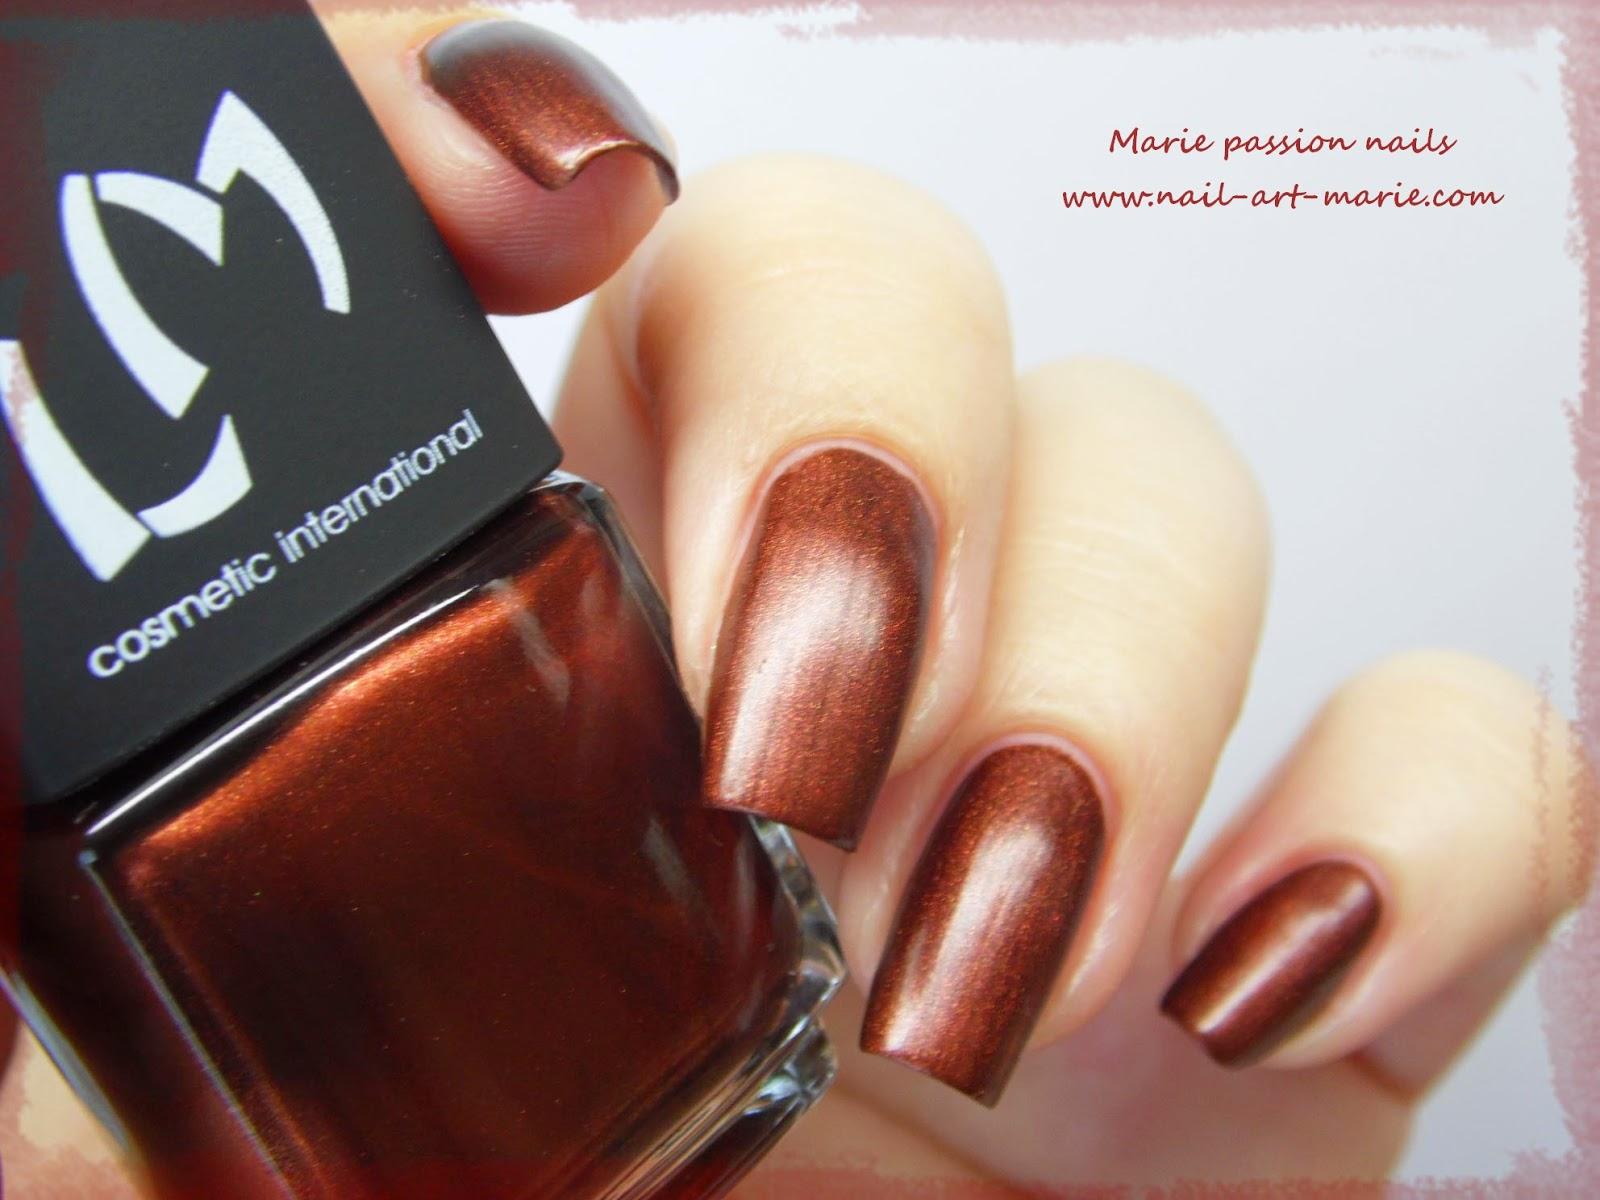 LM Cosmetic Taftasy7